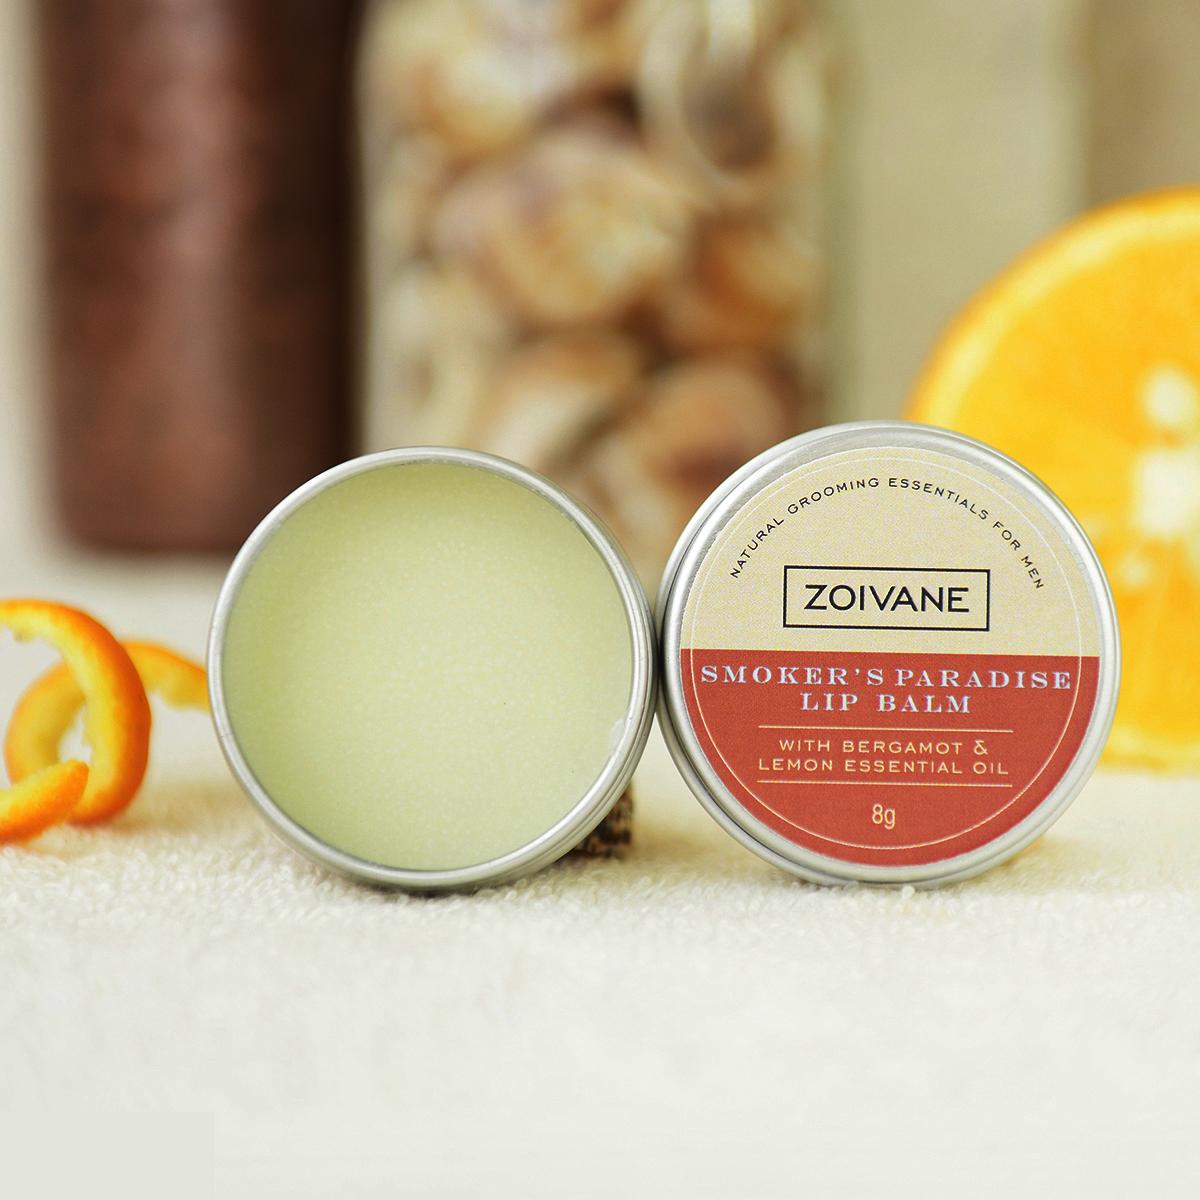 zoivanemen Zoivane Men Natural Lip Balm | Pack Of 2 Desire And Smoker Lip Balm For Men (10 Gm Per Product)